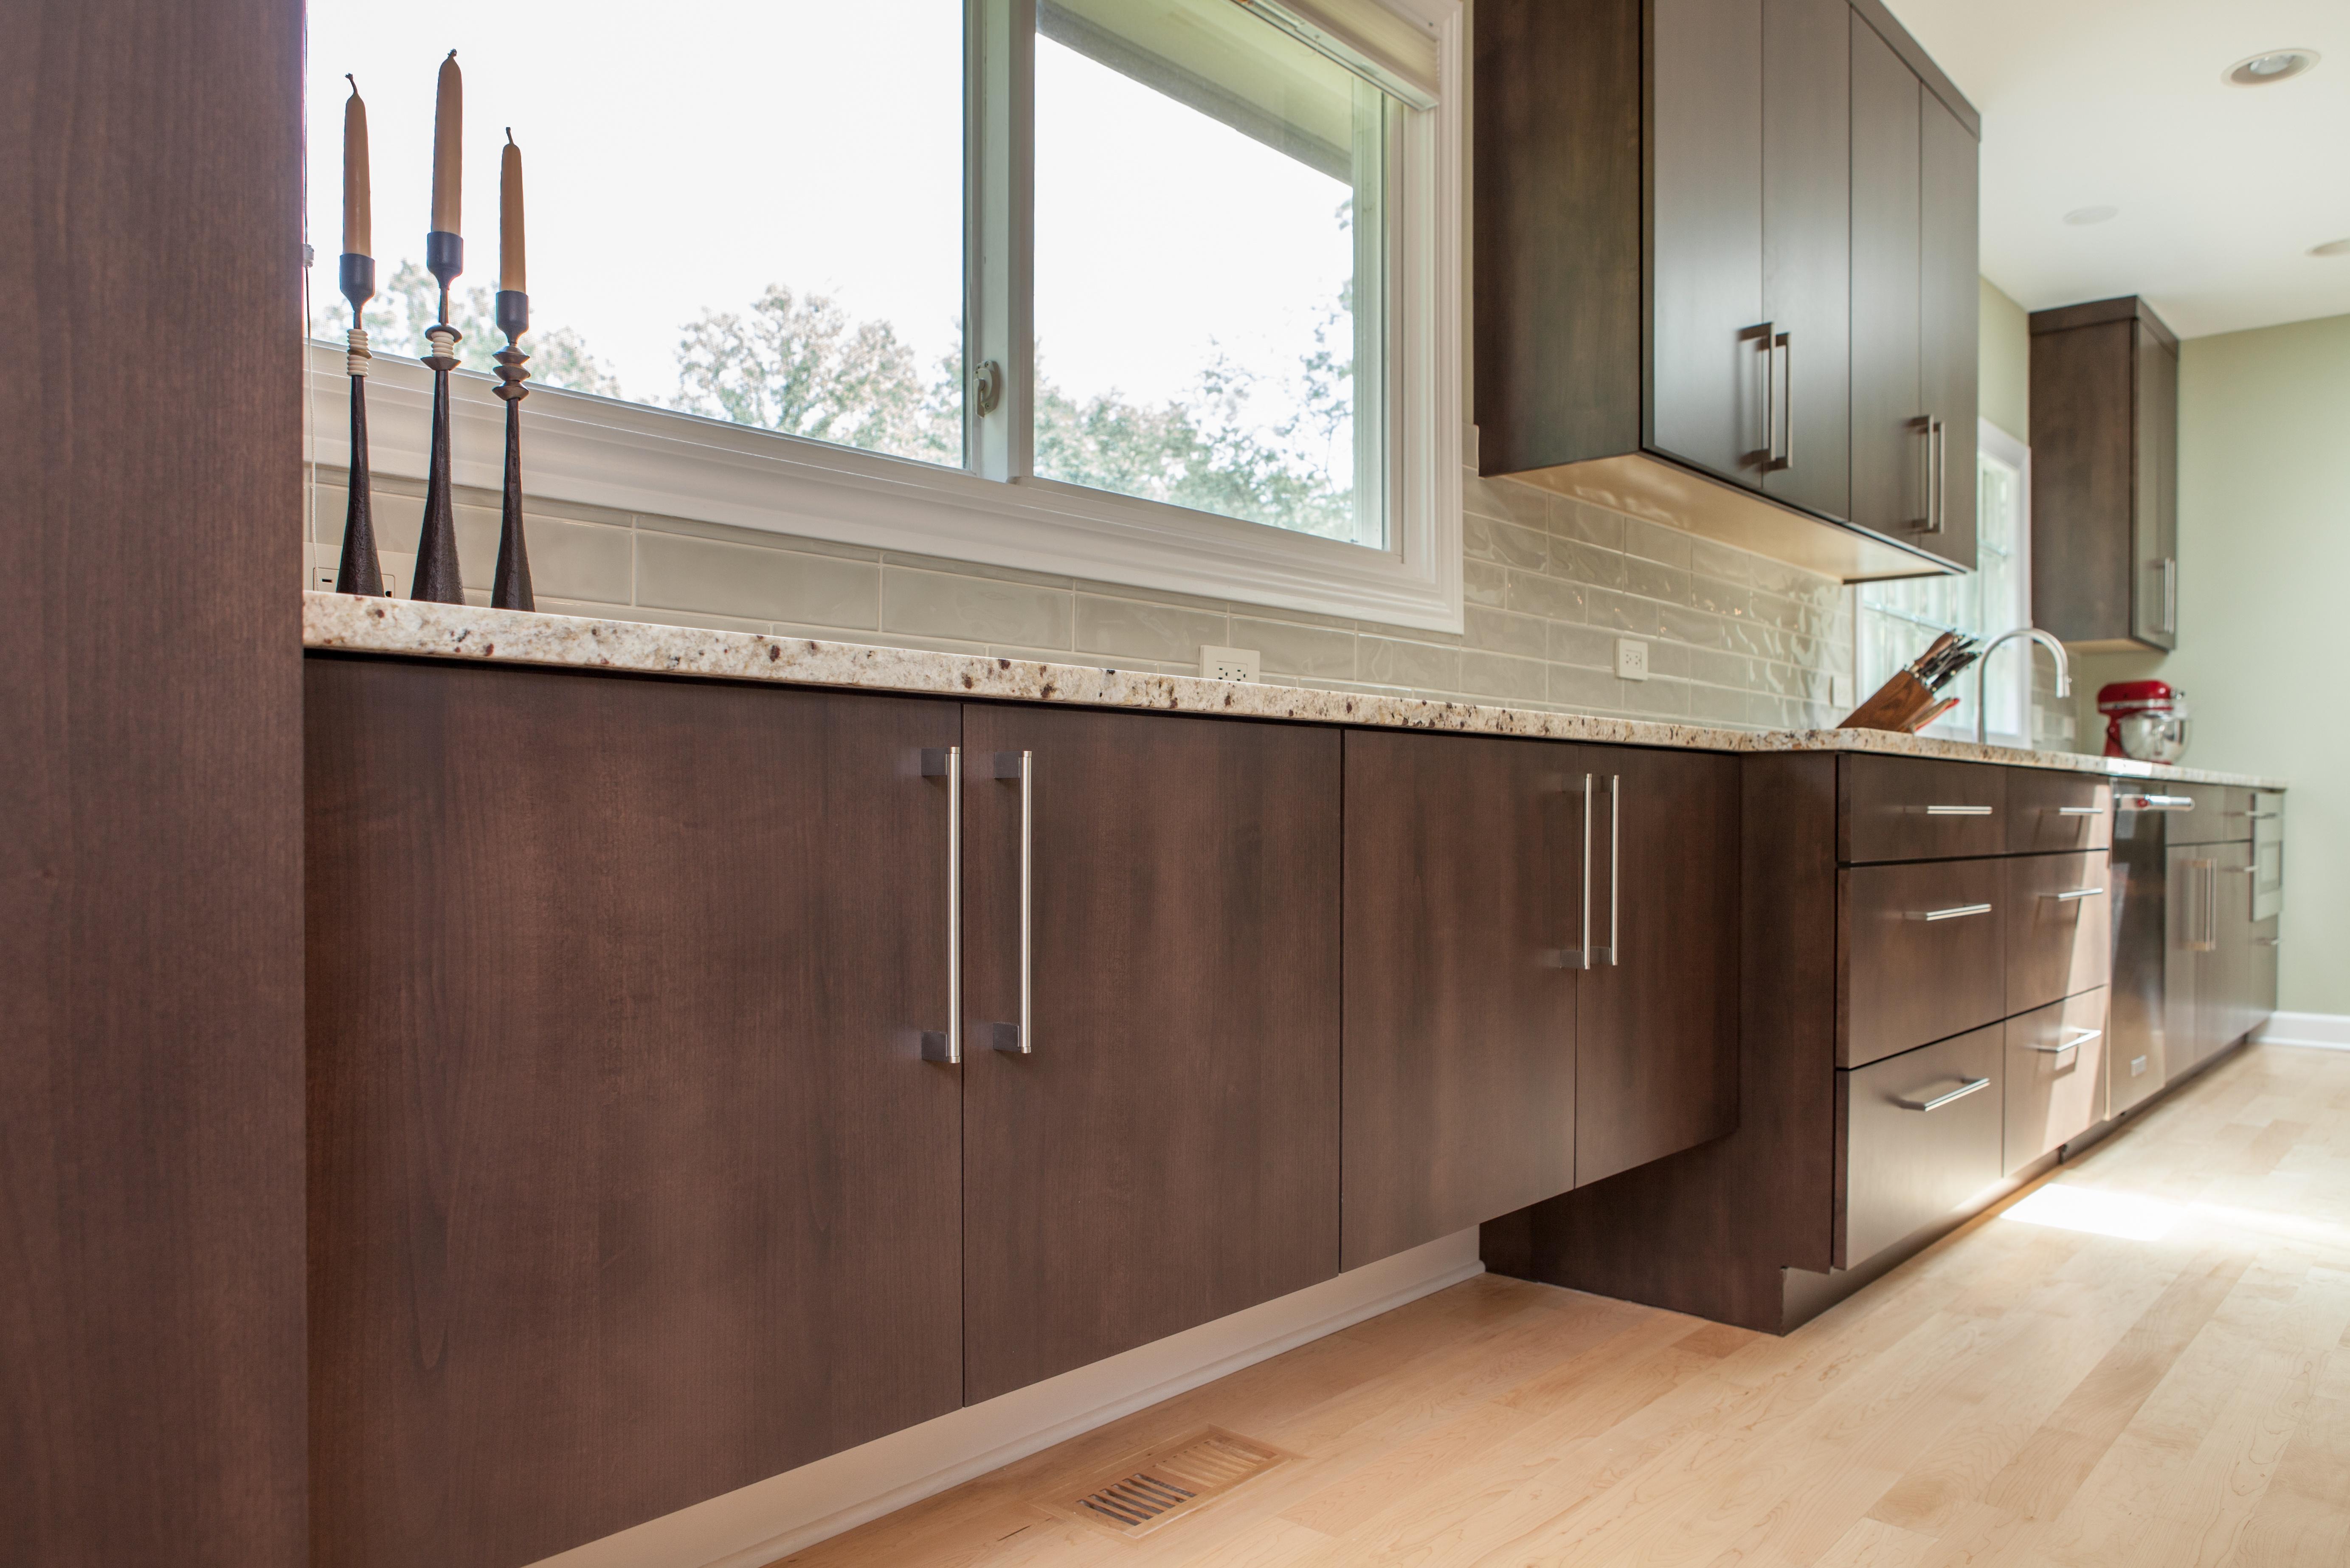 Cabinetry - plenty of kitchen storage